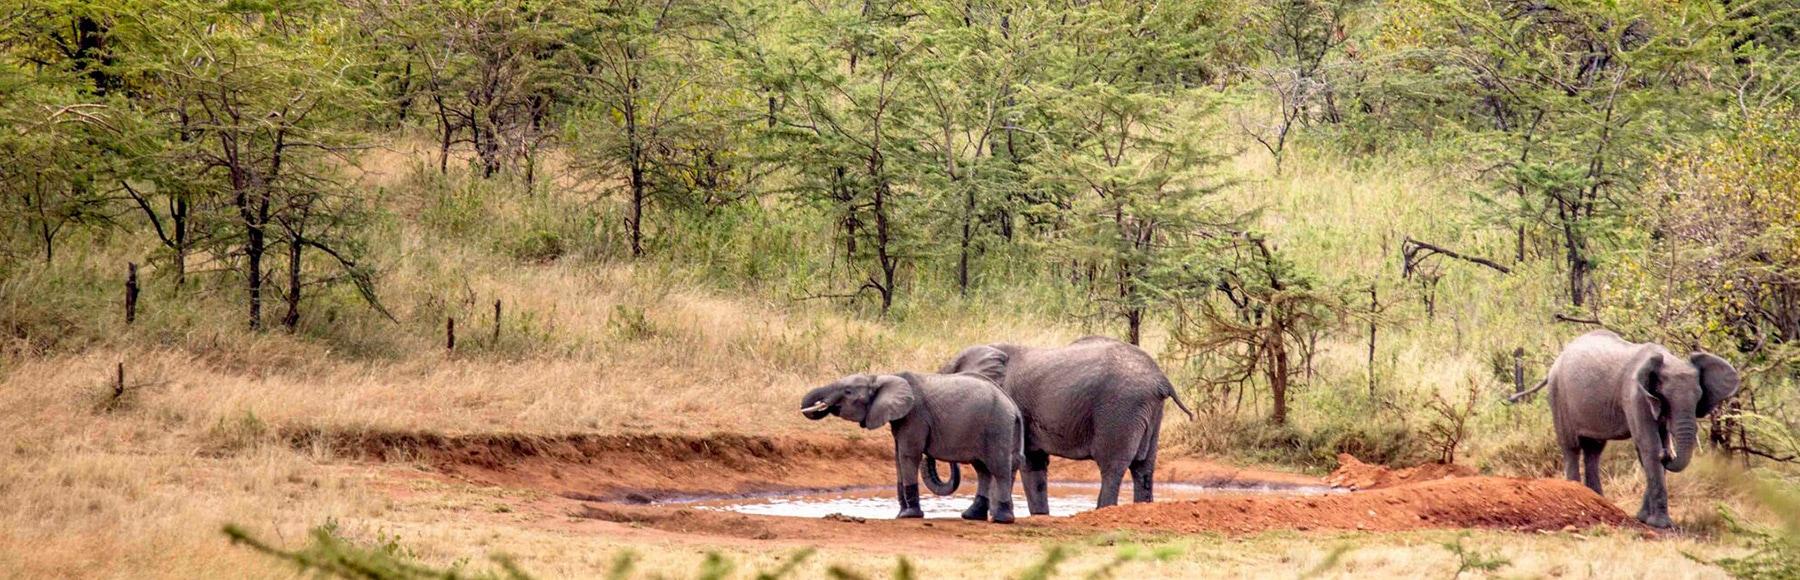 banner-elephant-trails-2